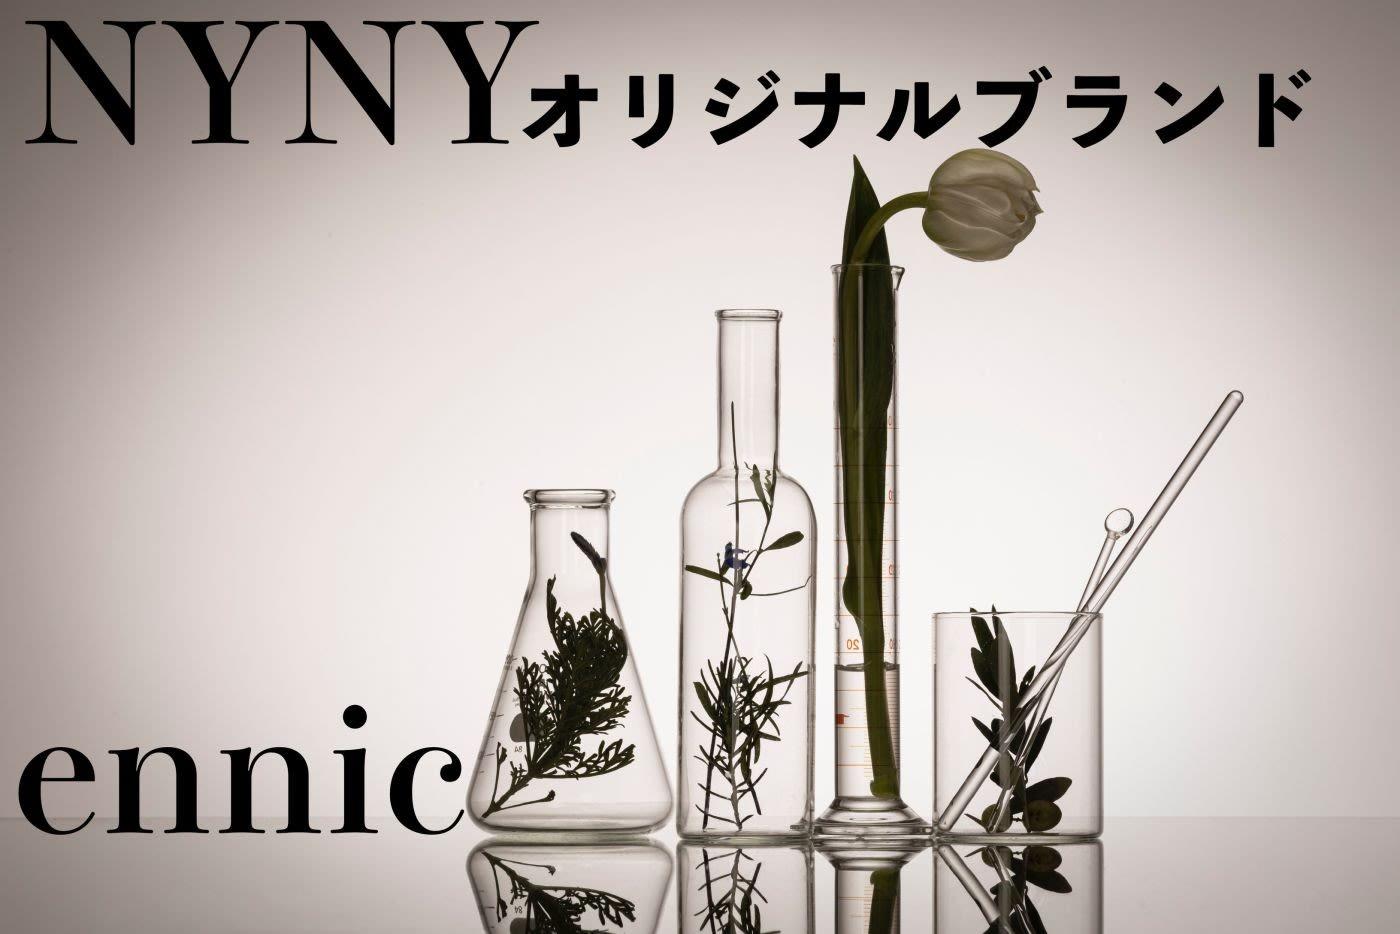 【NYNYオリジナル商品】肌髪コスメennic(エニック)!安心してお使い頂ける新ヘアケアシリーズ登場!